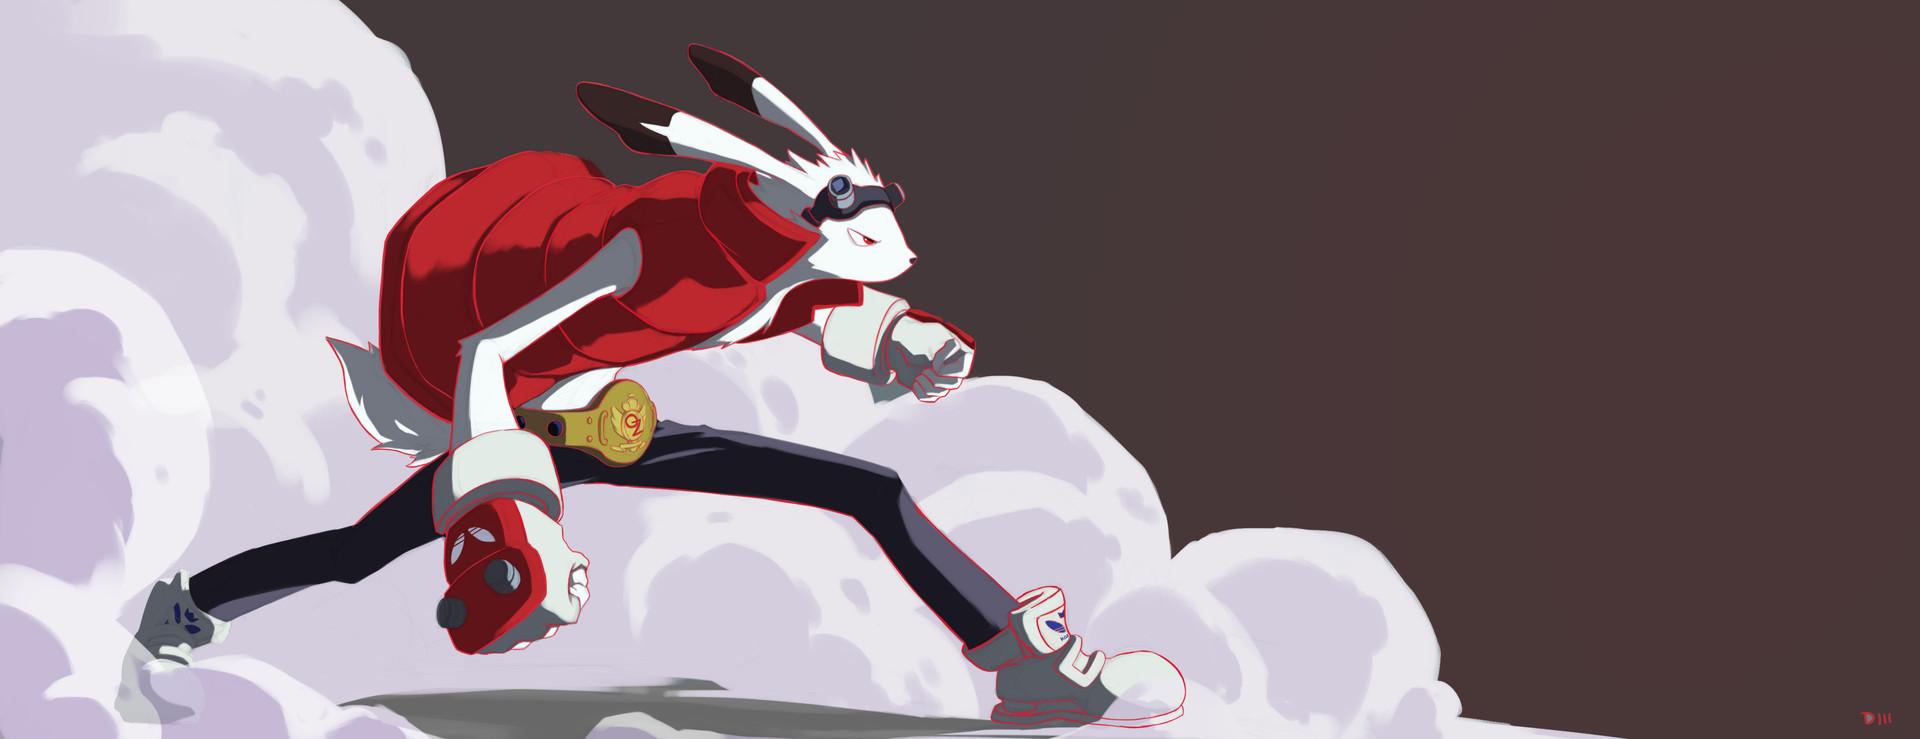 [RECIEN LLEGADO] Ficha de Hiro ''Super Carrot'' Dwayne-maico-kazma